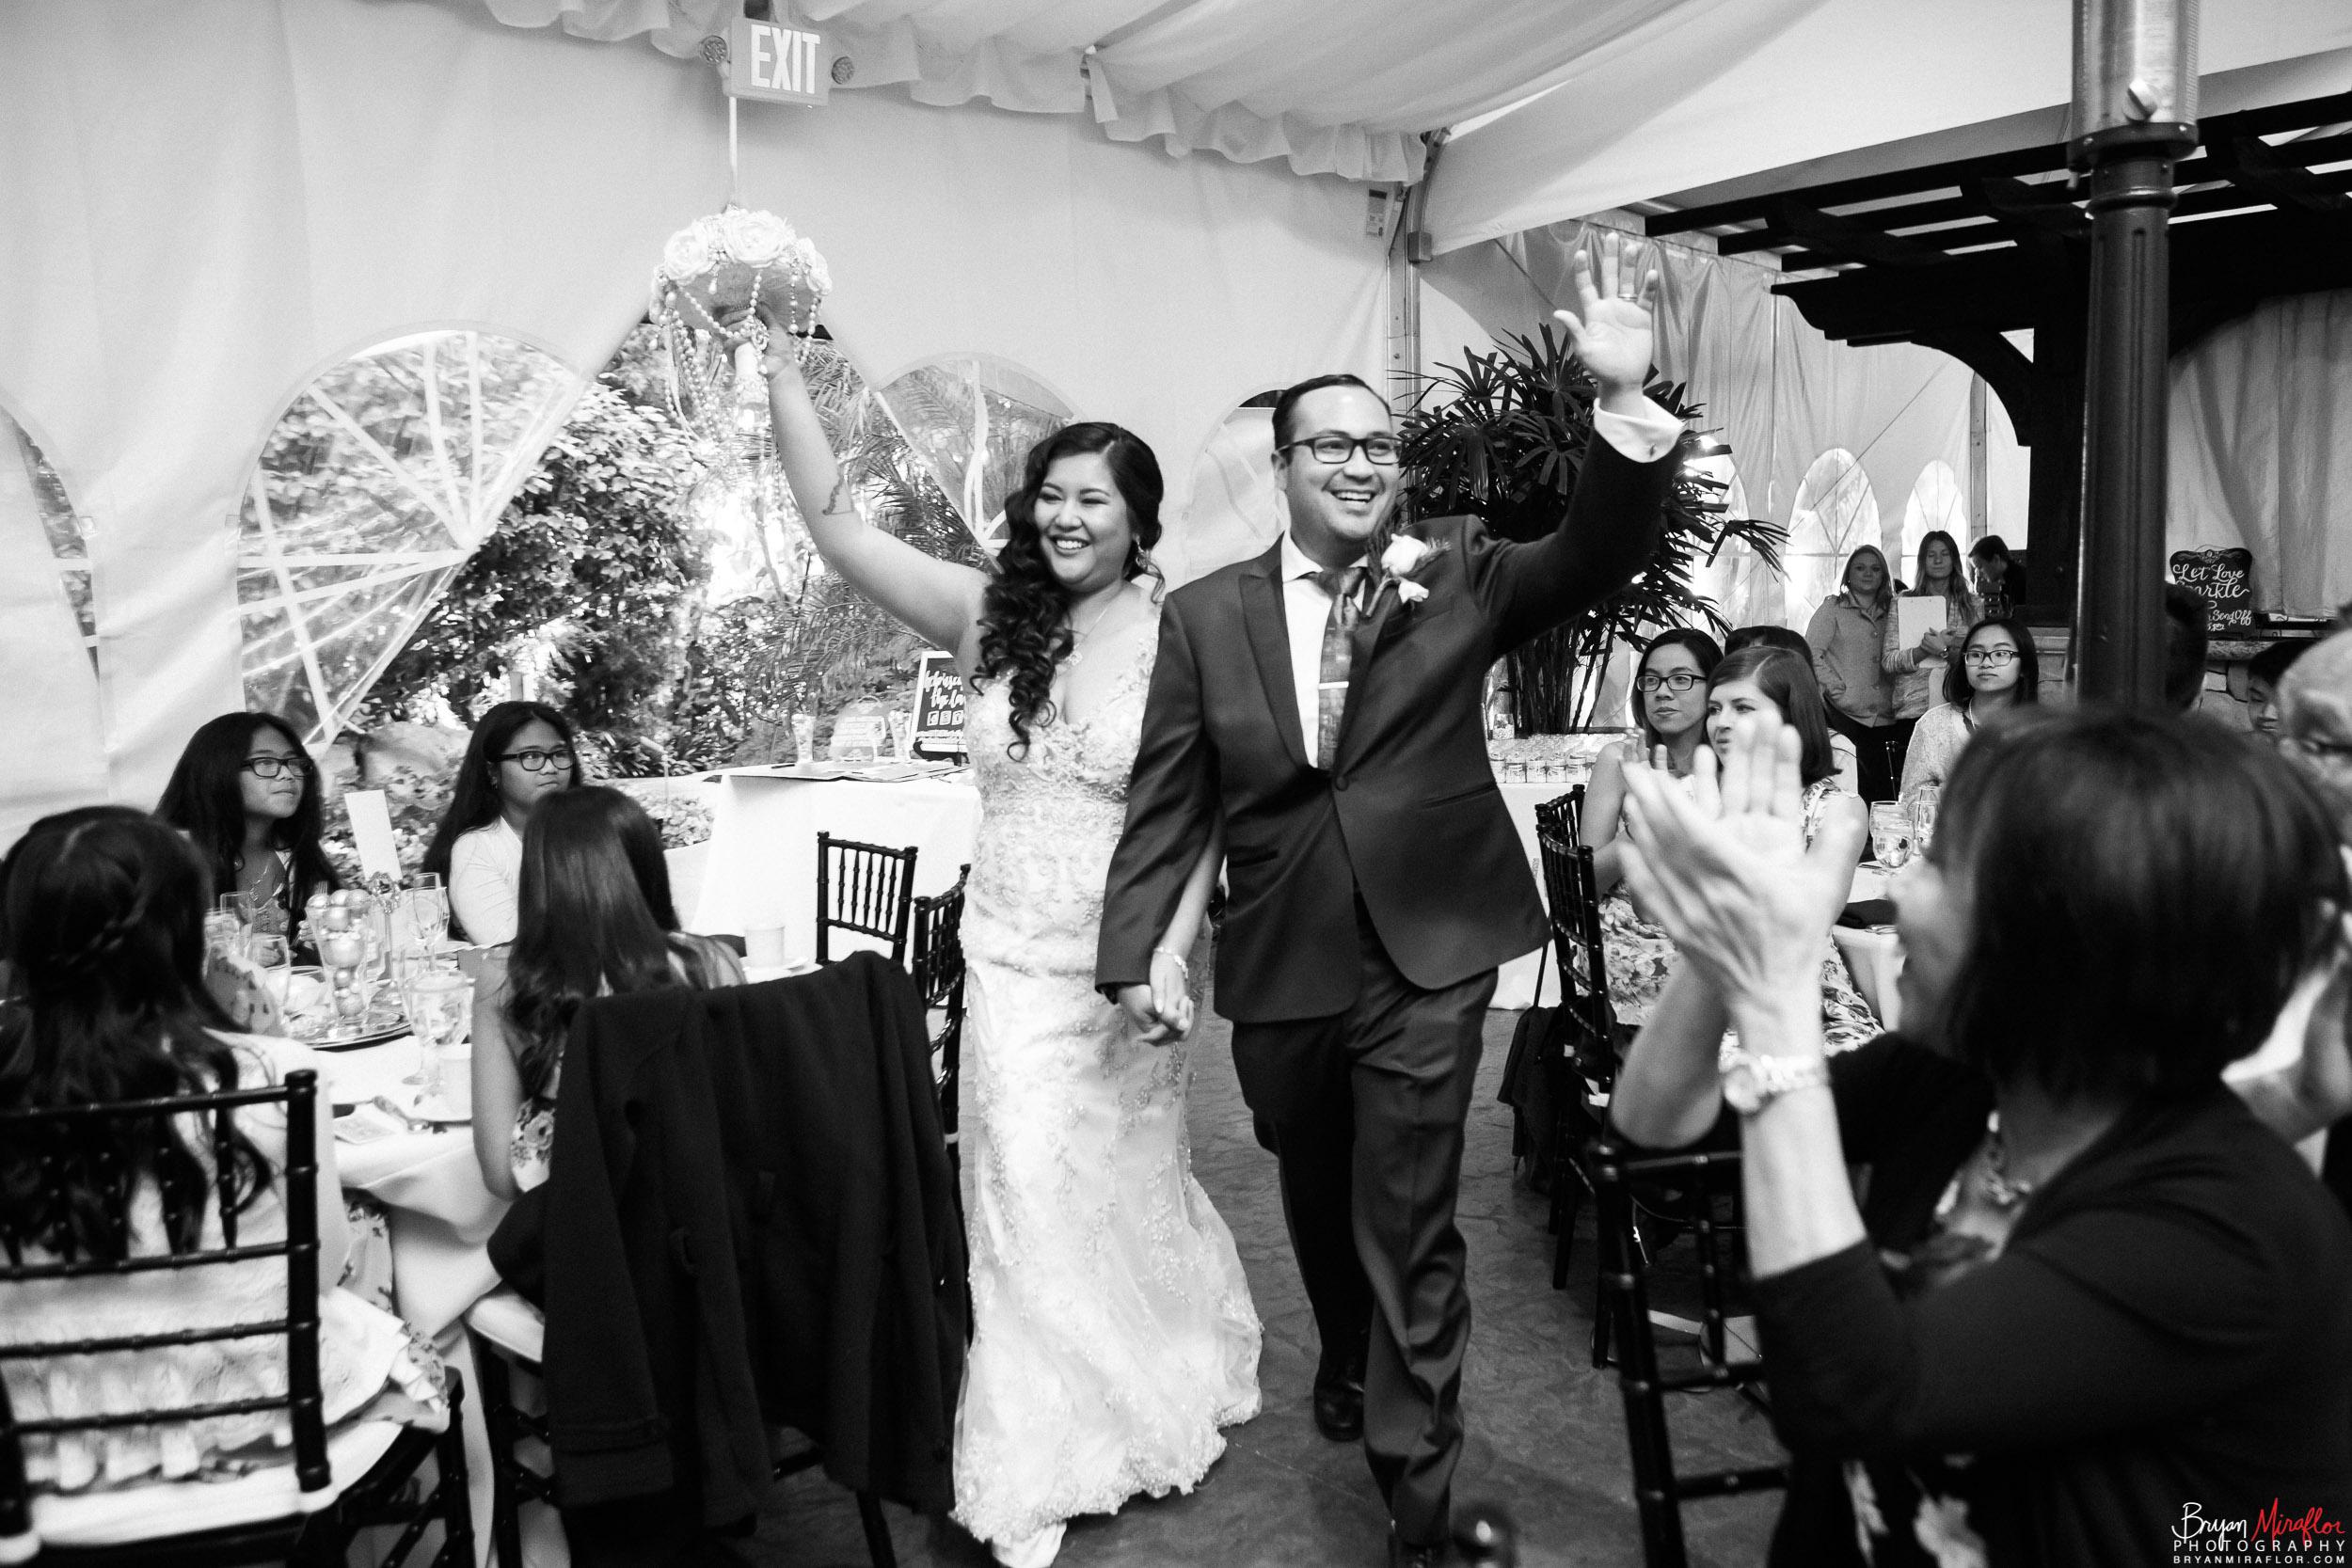 Bryan-Miraflor-Photography-Hannah-Jonathan-Married-Grand-Traditions-Estate-Gardens-Fallbrook-20171222-178.jpg